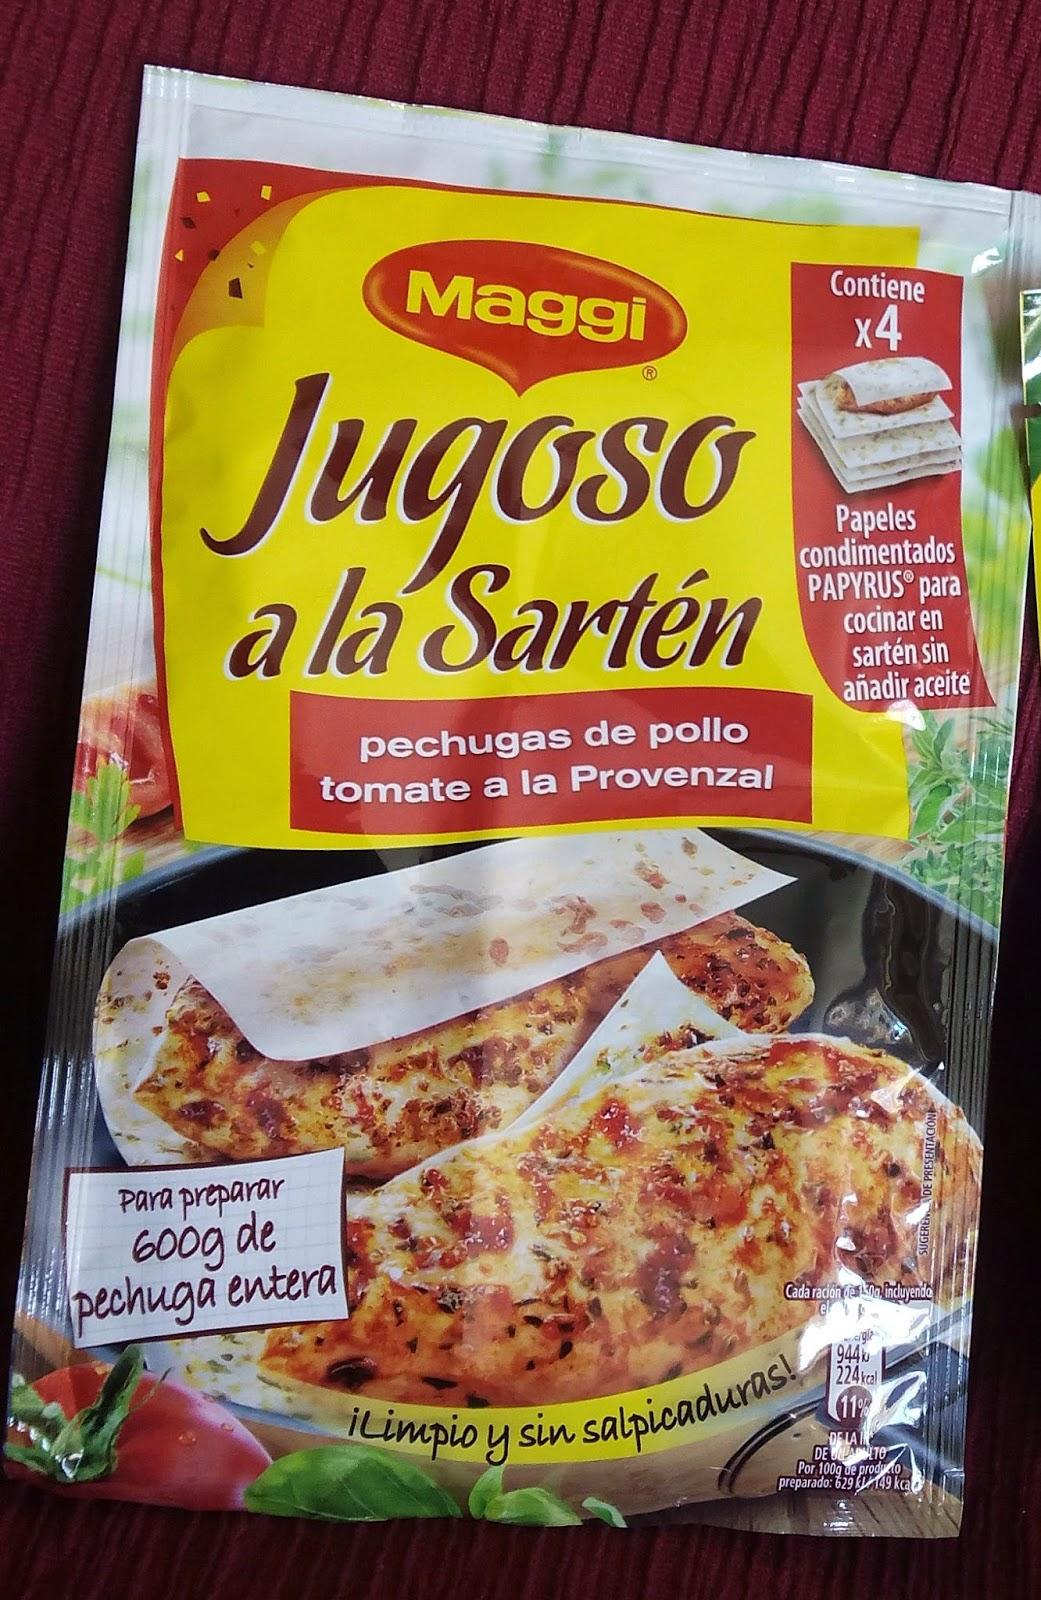 Jugoso a la Sartén de Maggi pechugas de pollo tomate a la provenzal